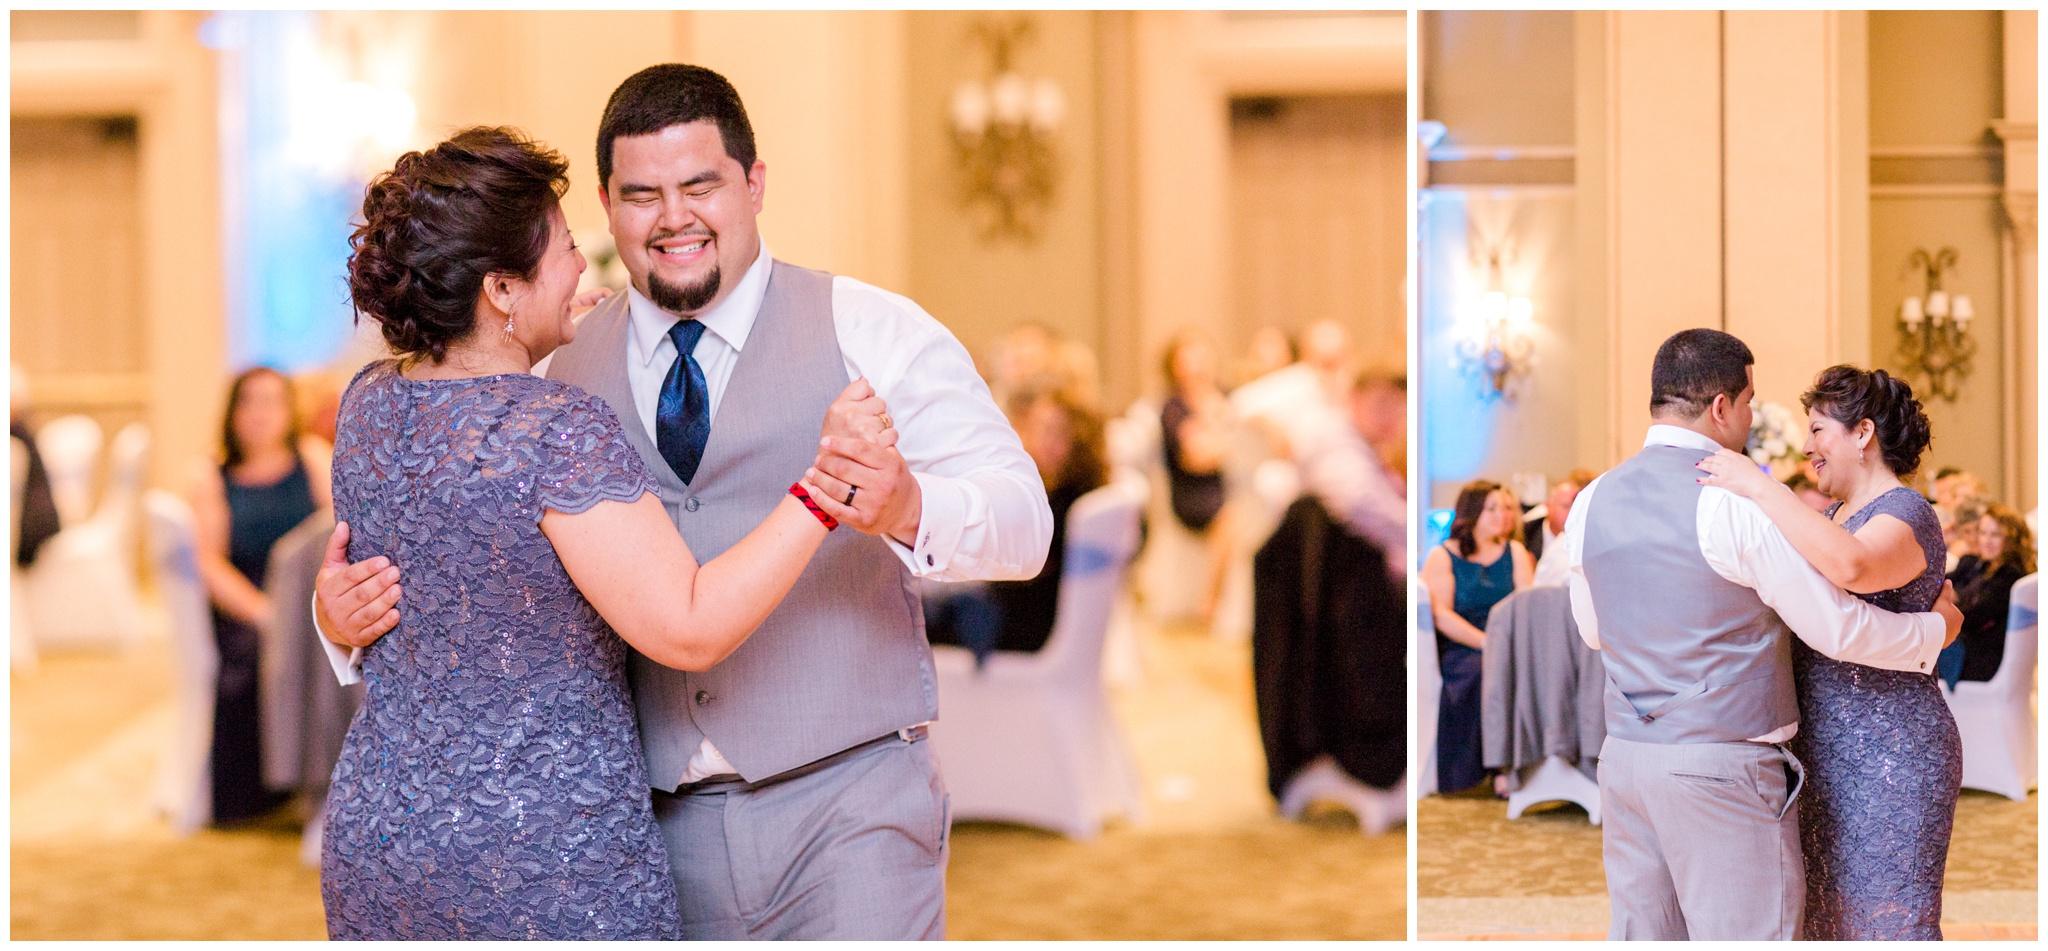 south-carolina-wedding-photographer-22